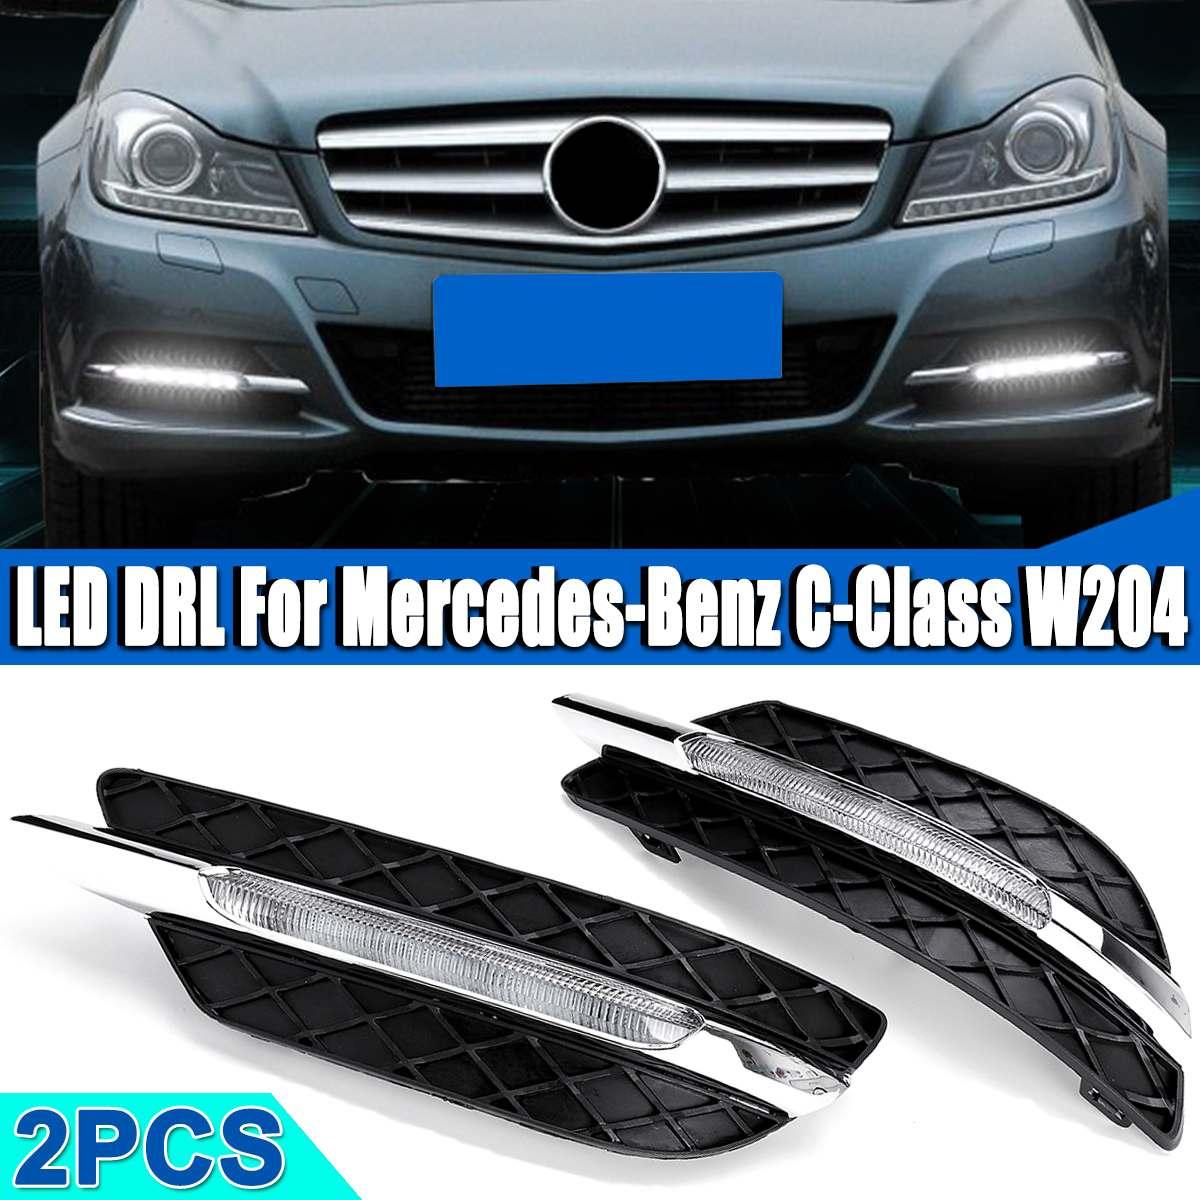 LED DRL White Daytime Running Light Amber Turn Signal Light Fog Lamps For Mercedes-Benz C-Class W204 2011 2012 2013